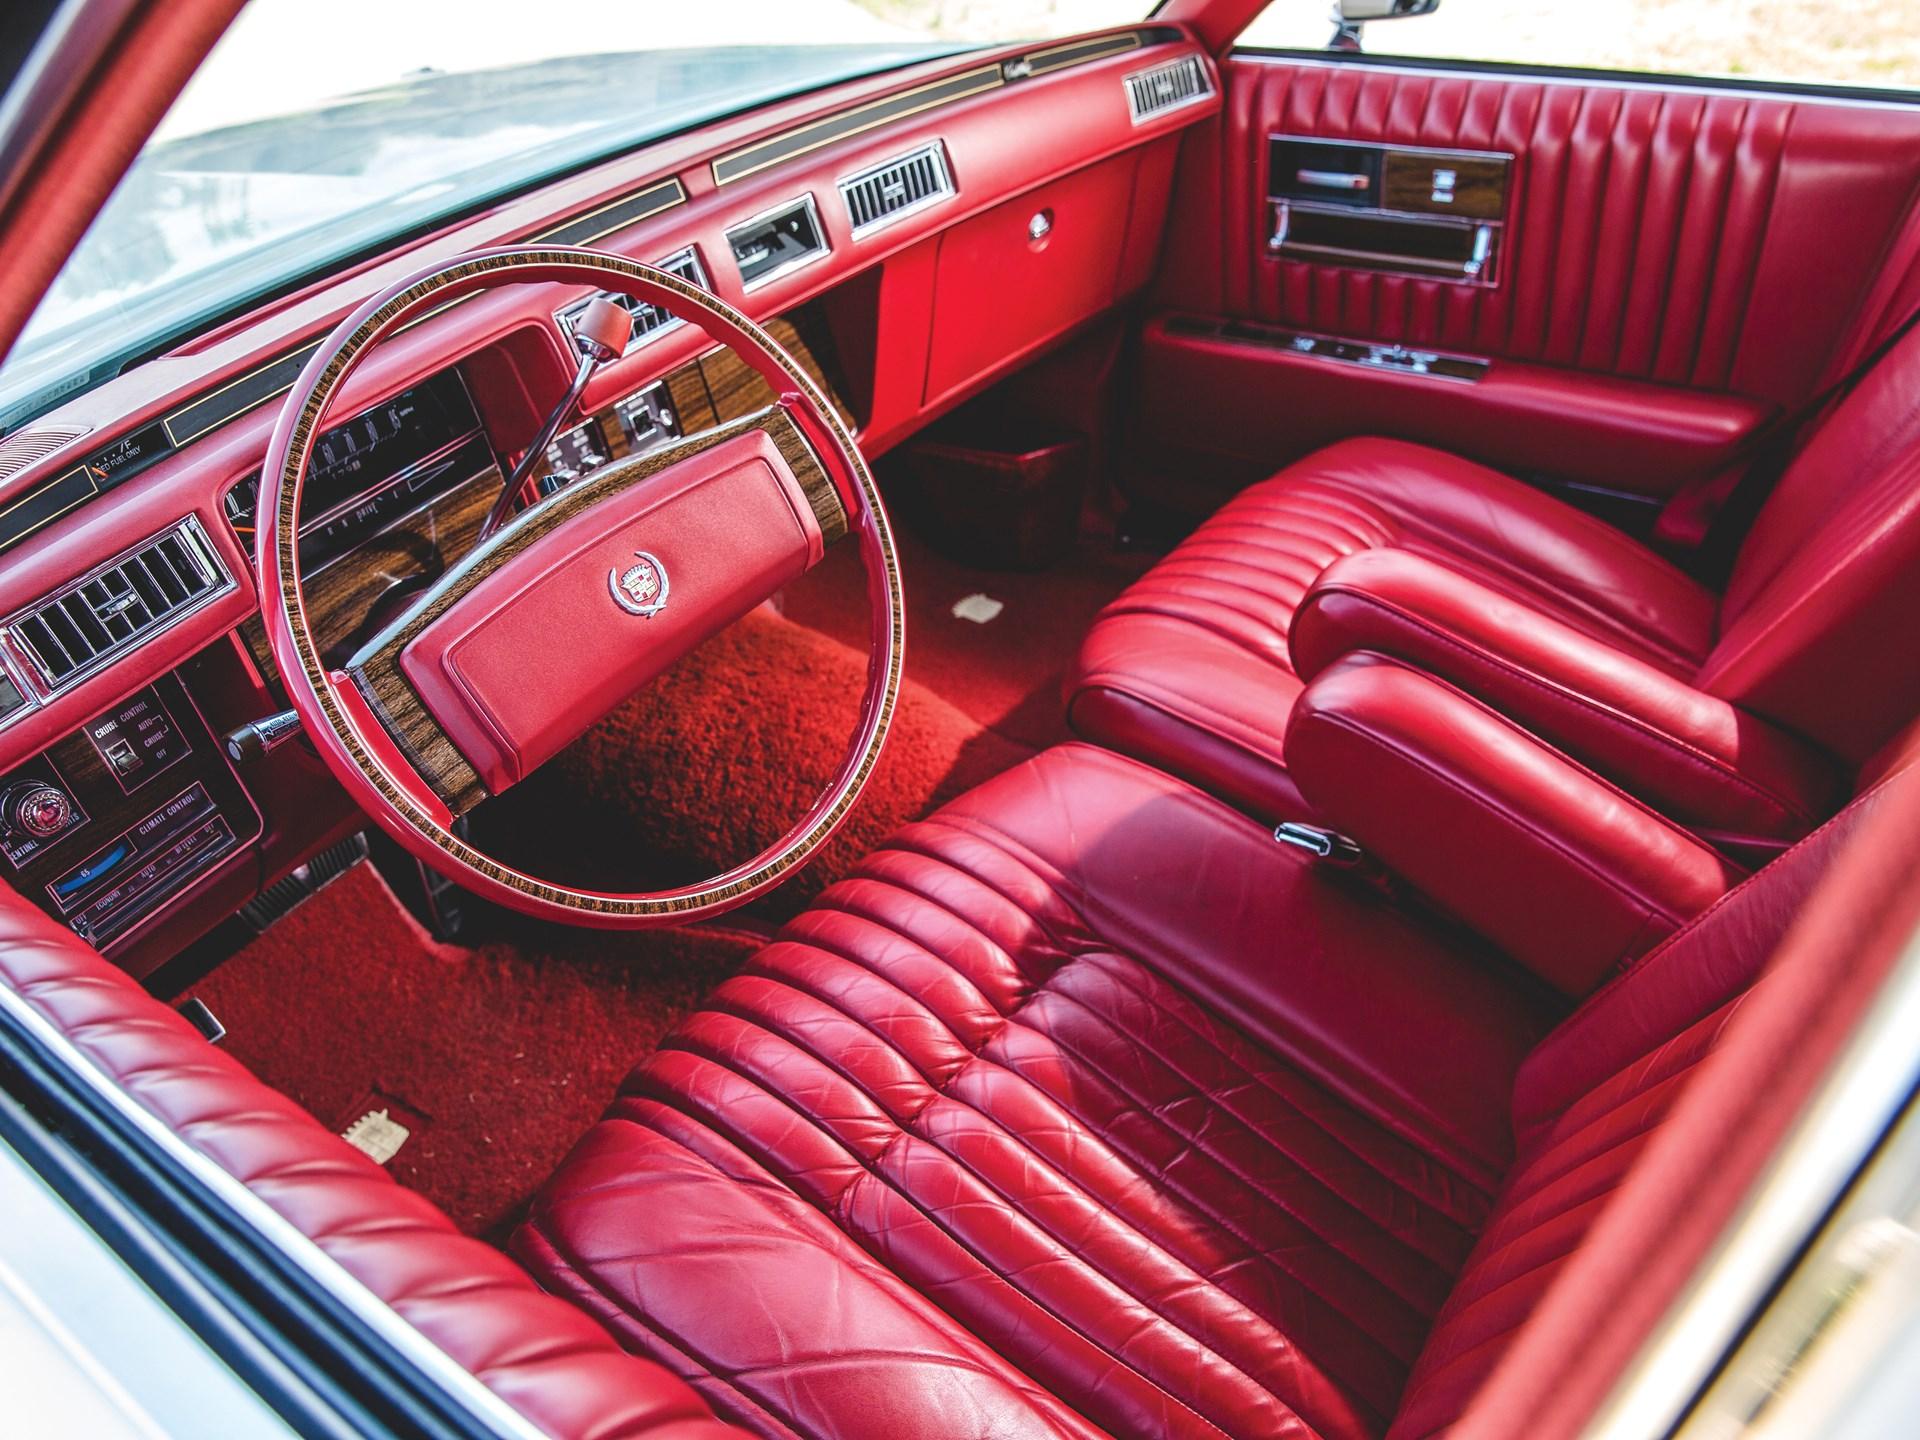 1977 Cadillac Seville